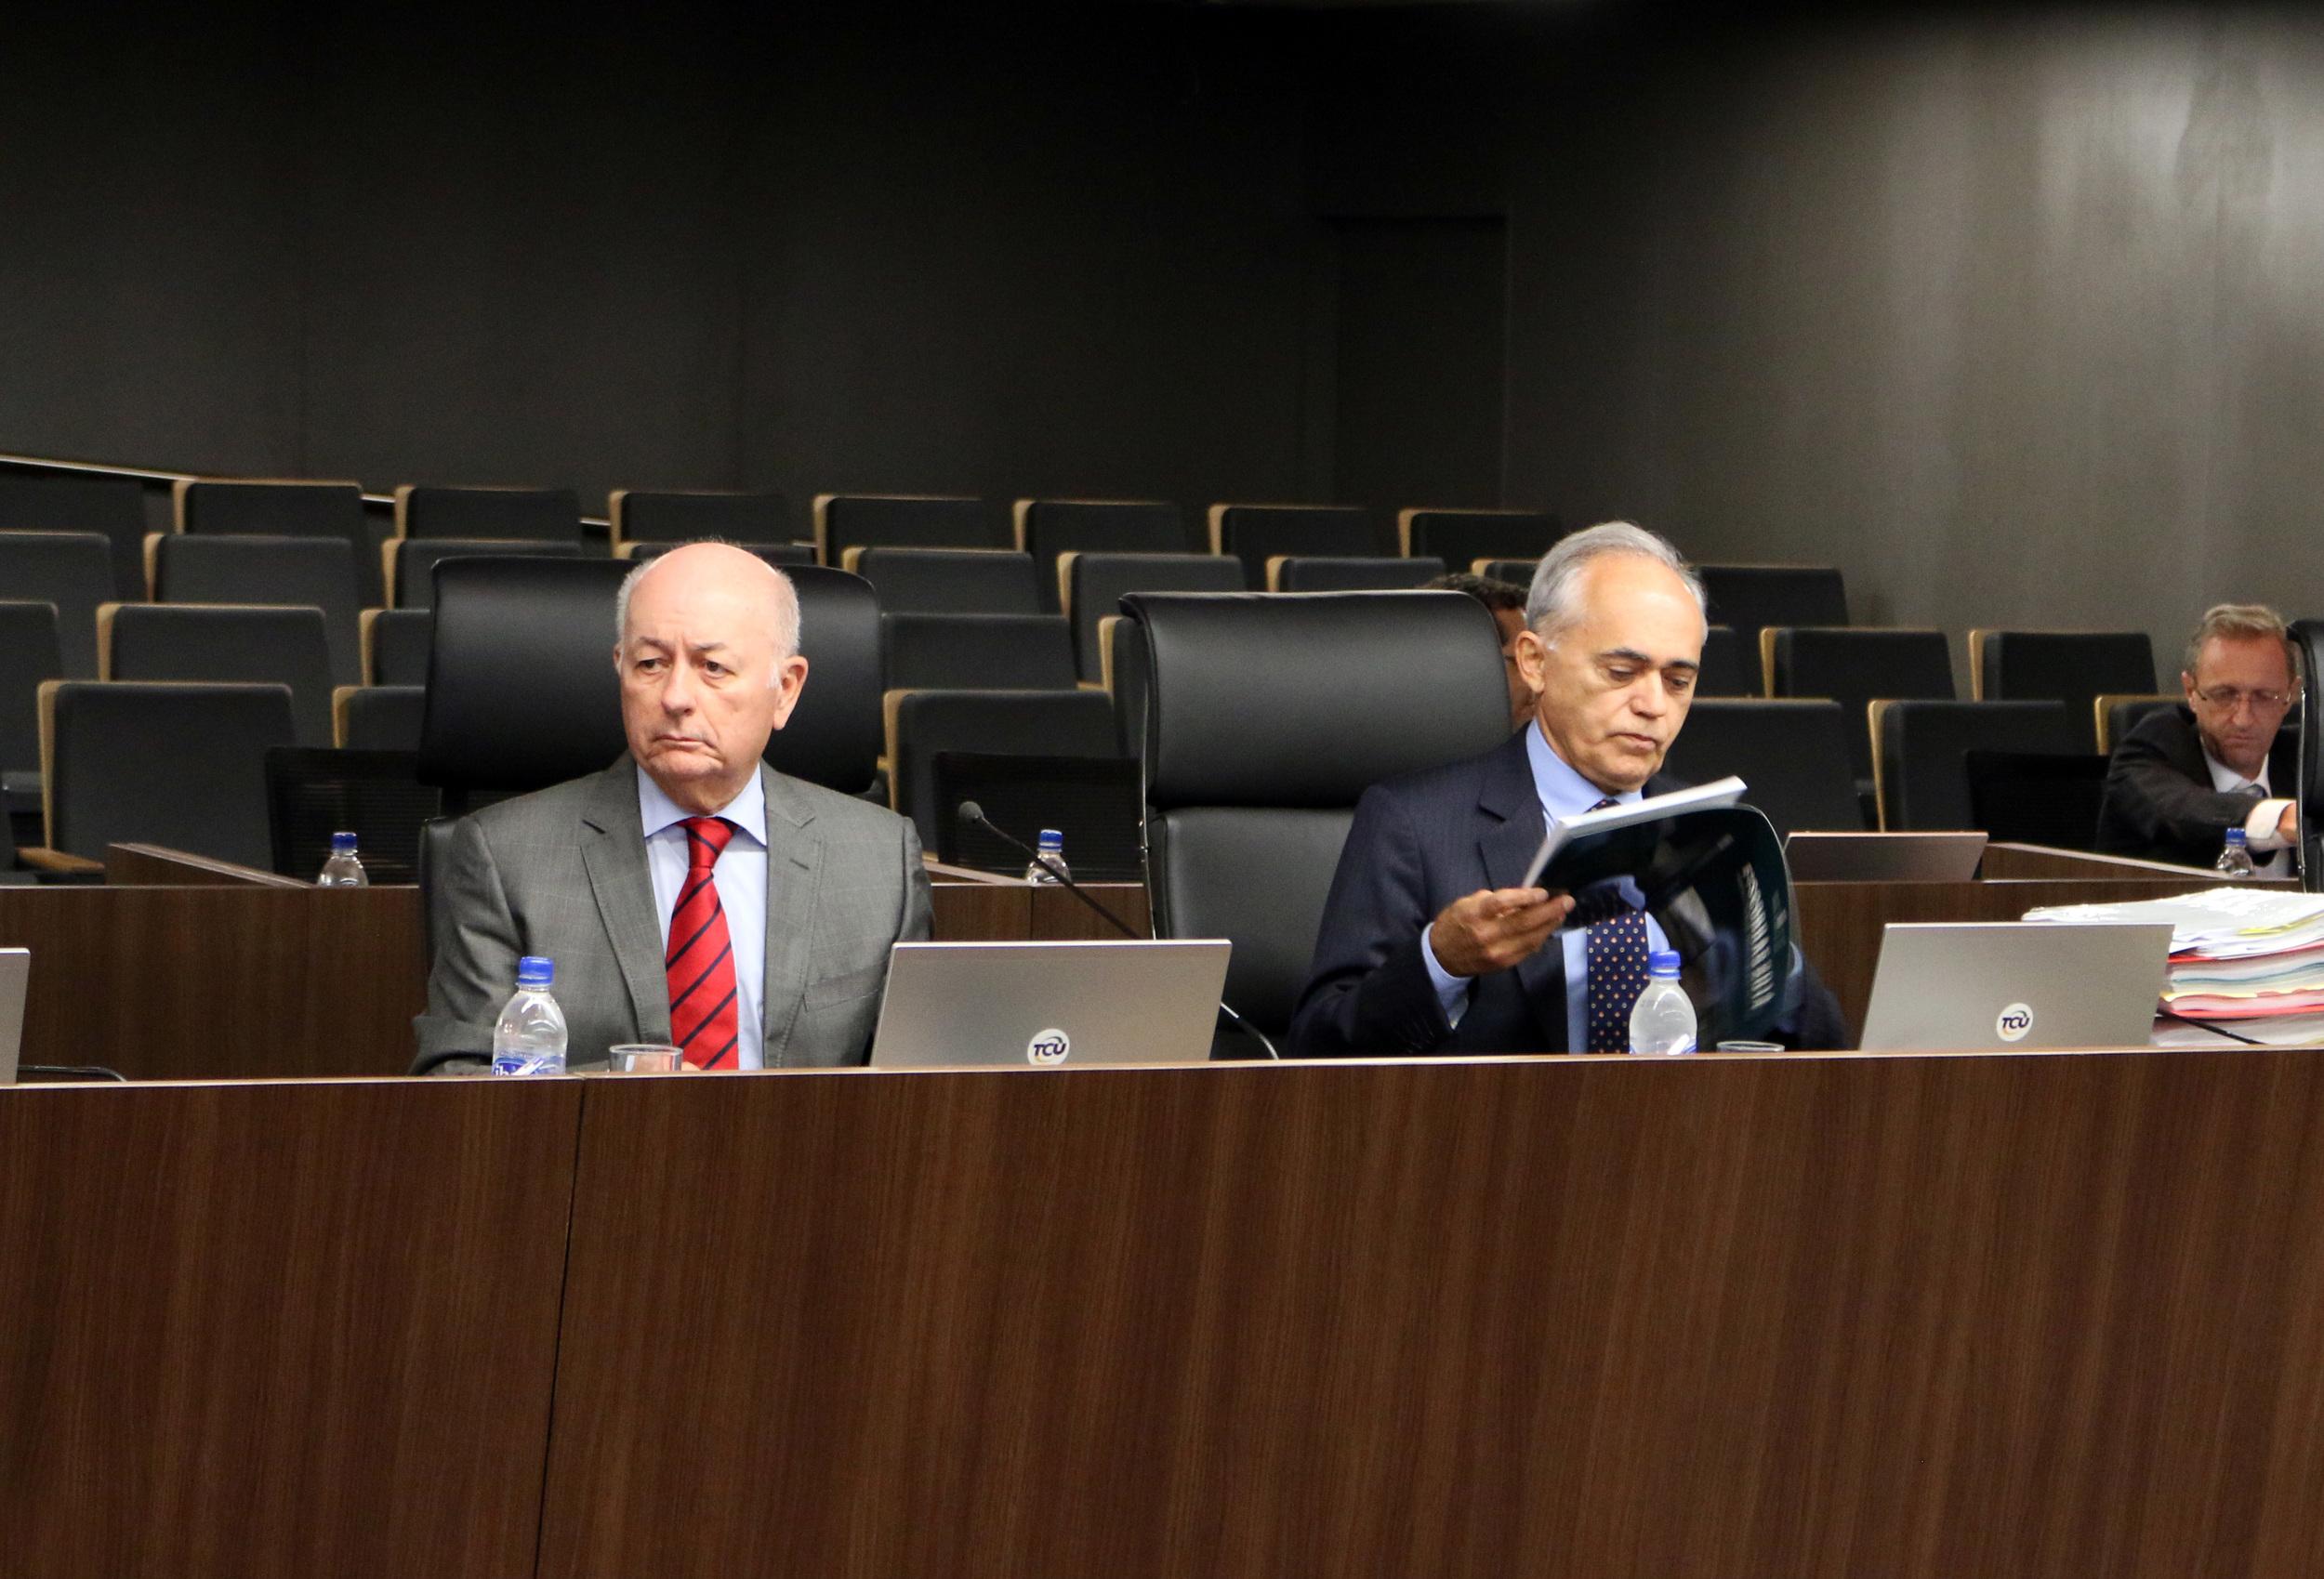 Ministro José Jorge e ministro Raimundo Carreiro. Foto: Filipe Calmon / ANESP